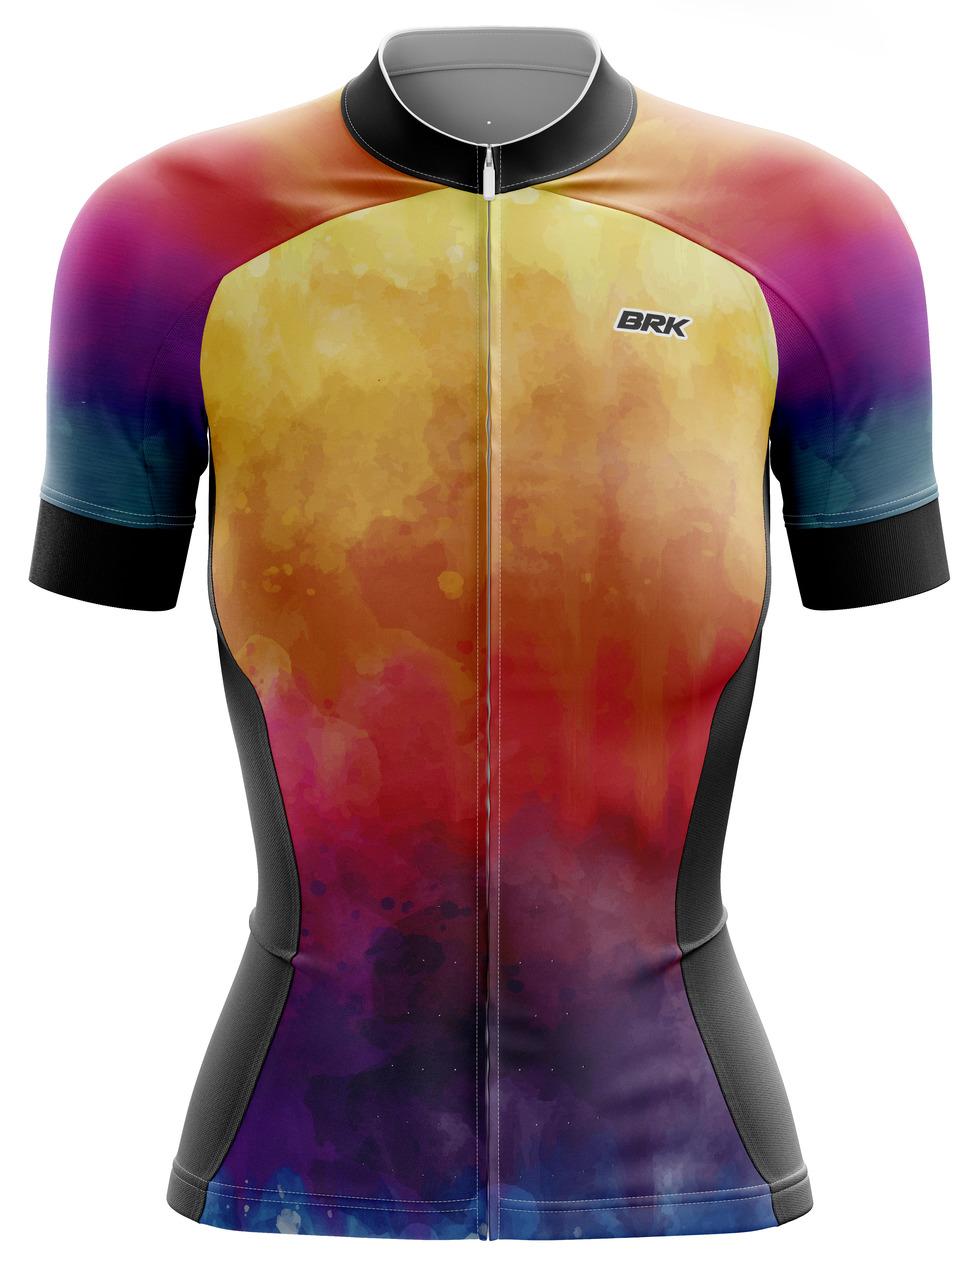 Camisa Ciclismo Brk Feminina Tie Dye Summer com FPU 50+